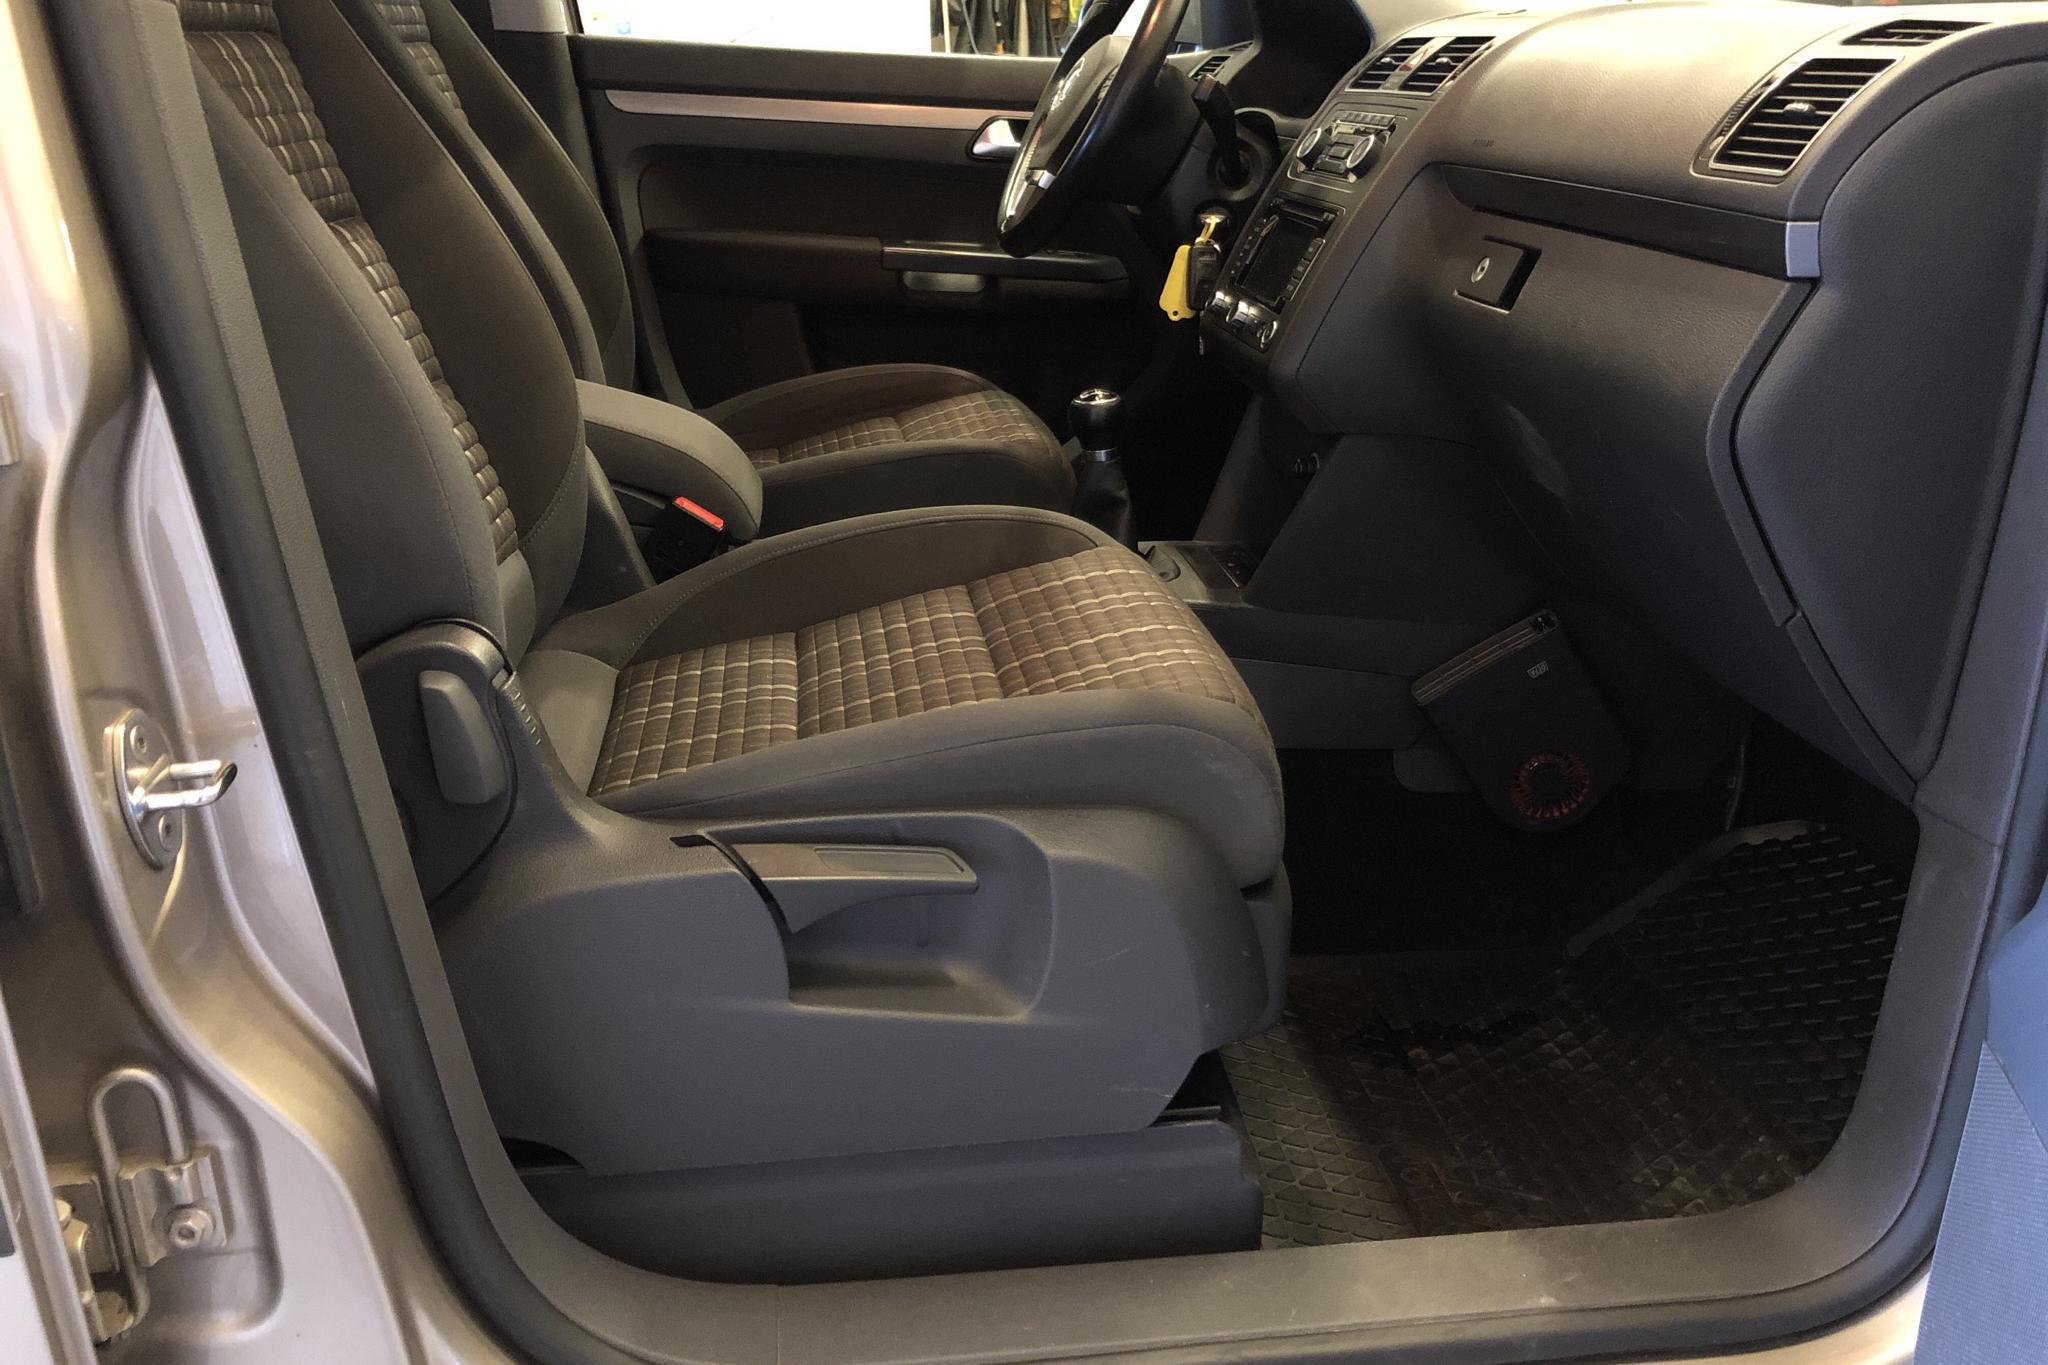 VW Touran 1.4 TSI (140hk) - 10 474 mil - Manuell - Light Brown - 2012